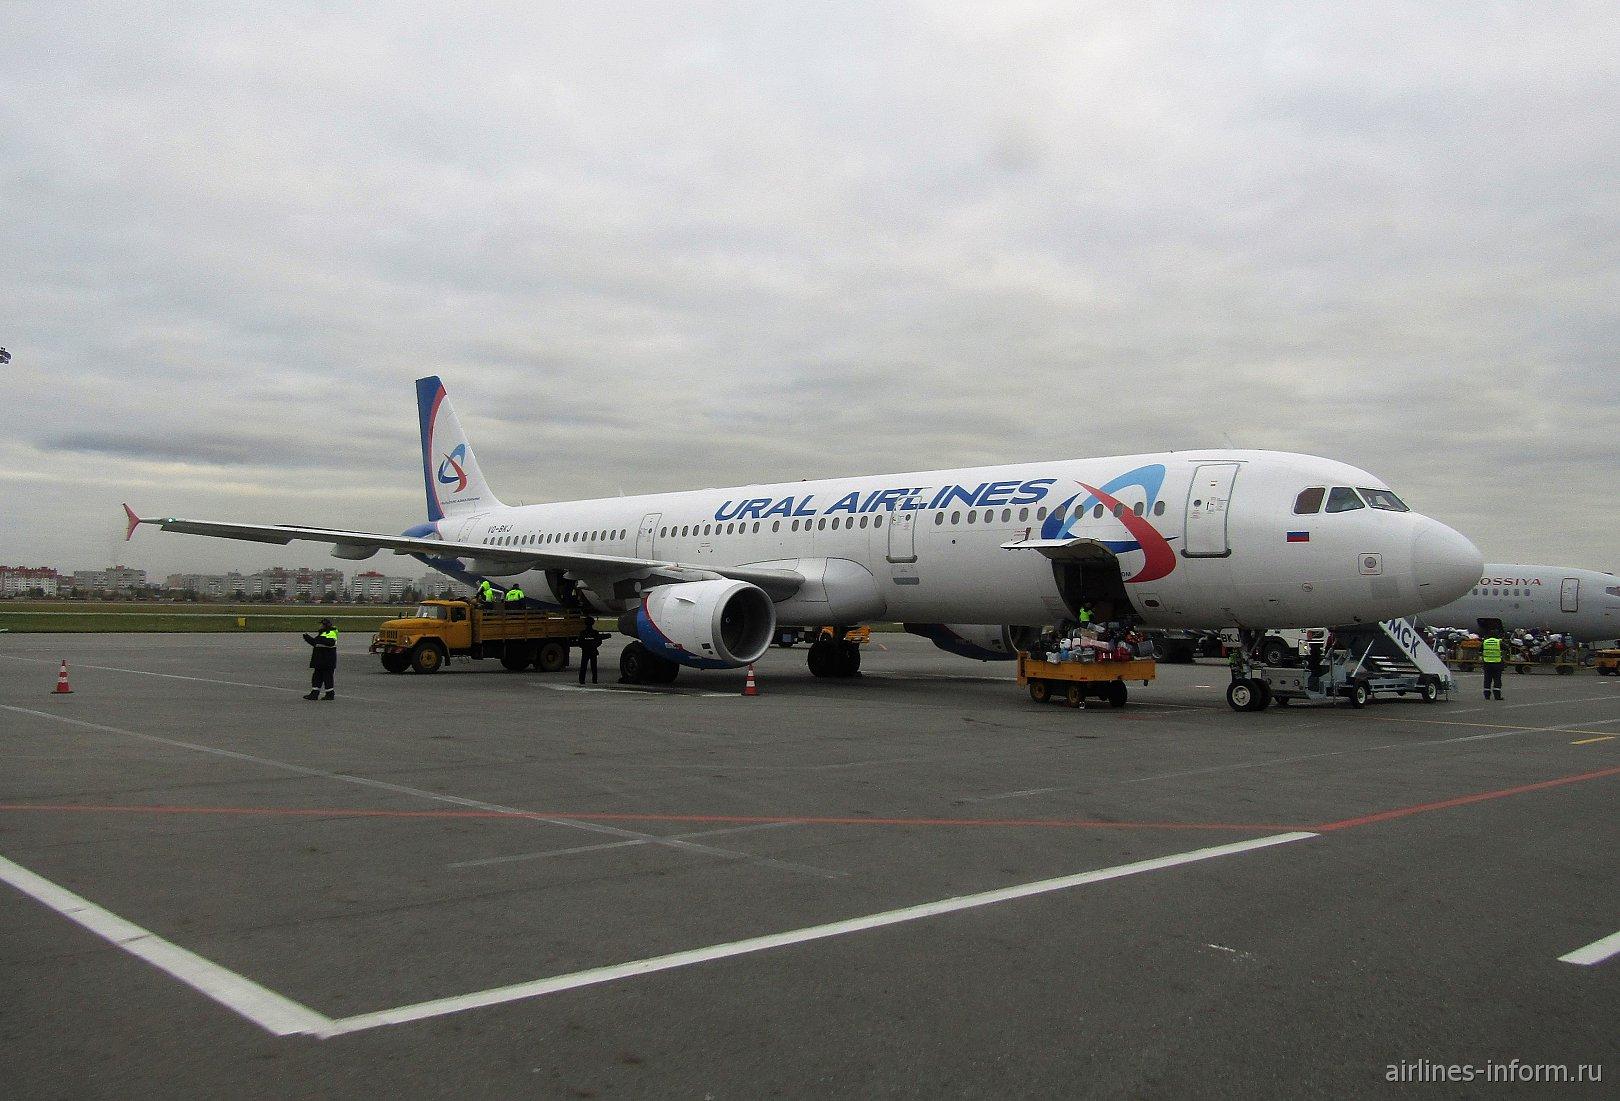 Airbus A321 VQ-BKJ Уральских авиалиний в аэропорту Домодедово